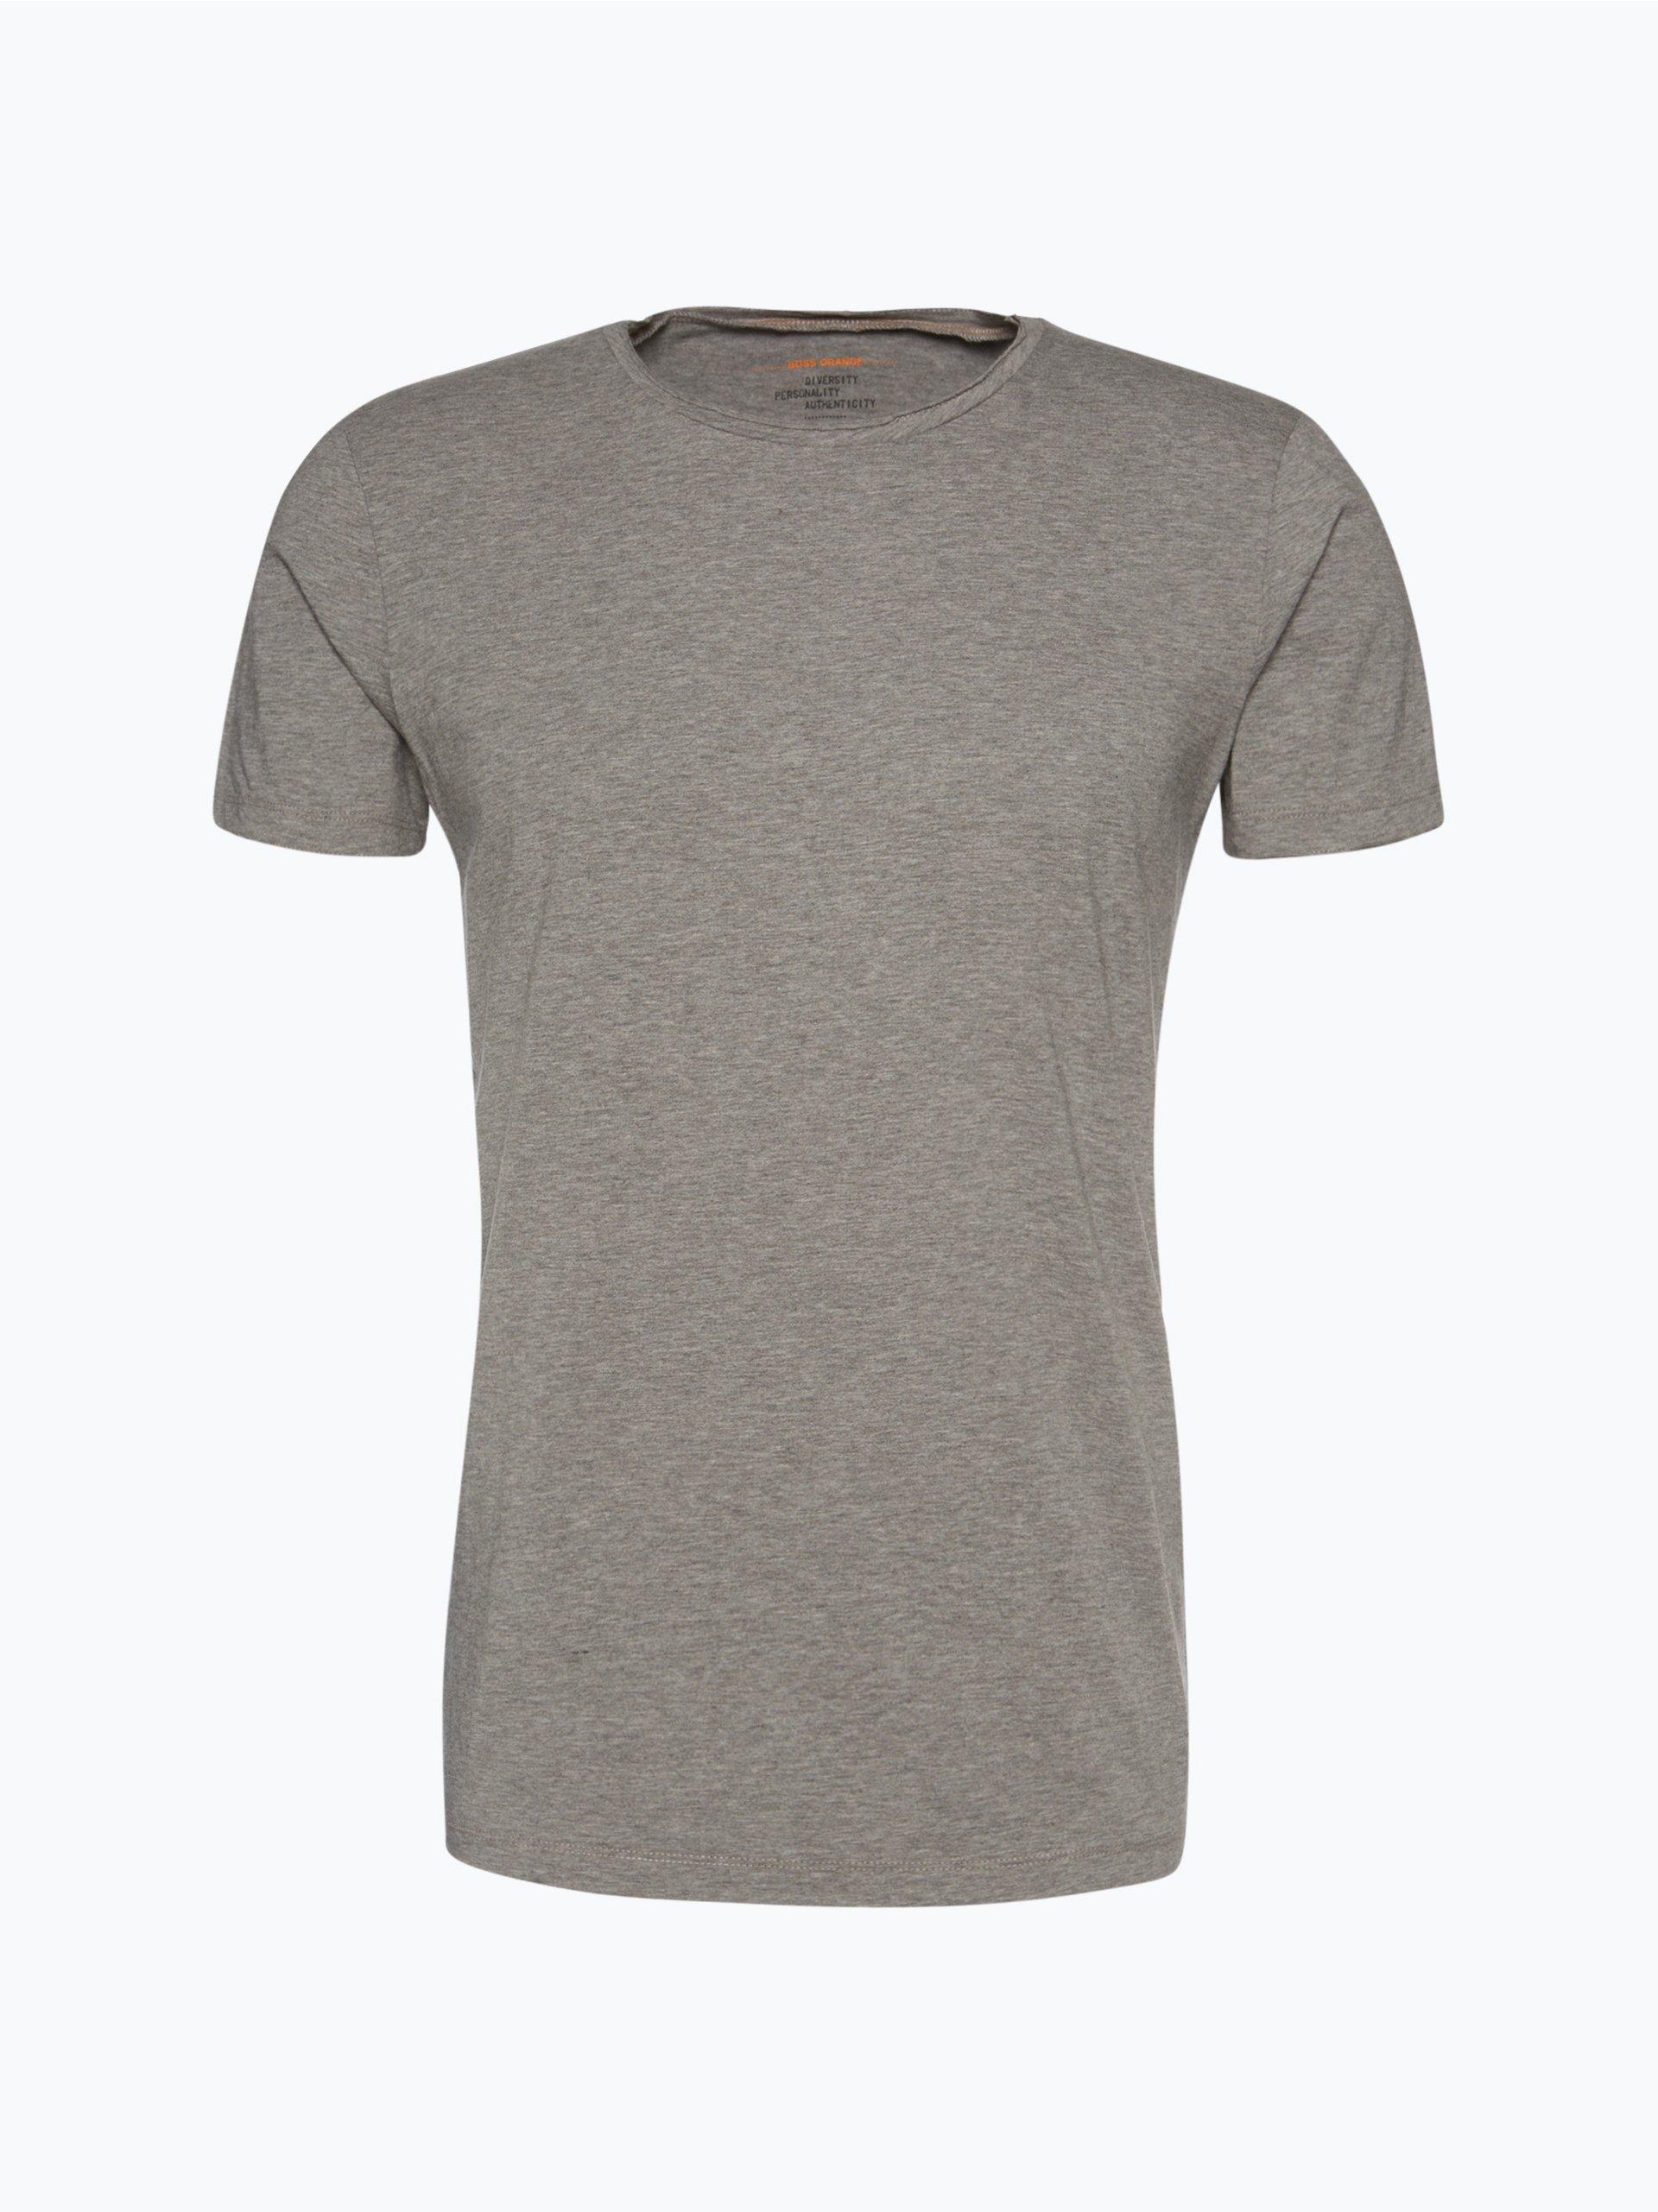 boss casual herren t shirt tooles grau uni online kaufen. Black Bedroom Furniture Sets. Home Design Ideas